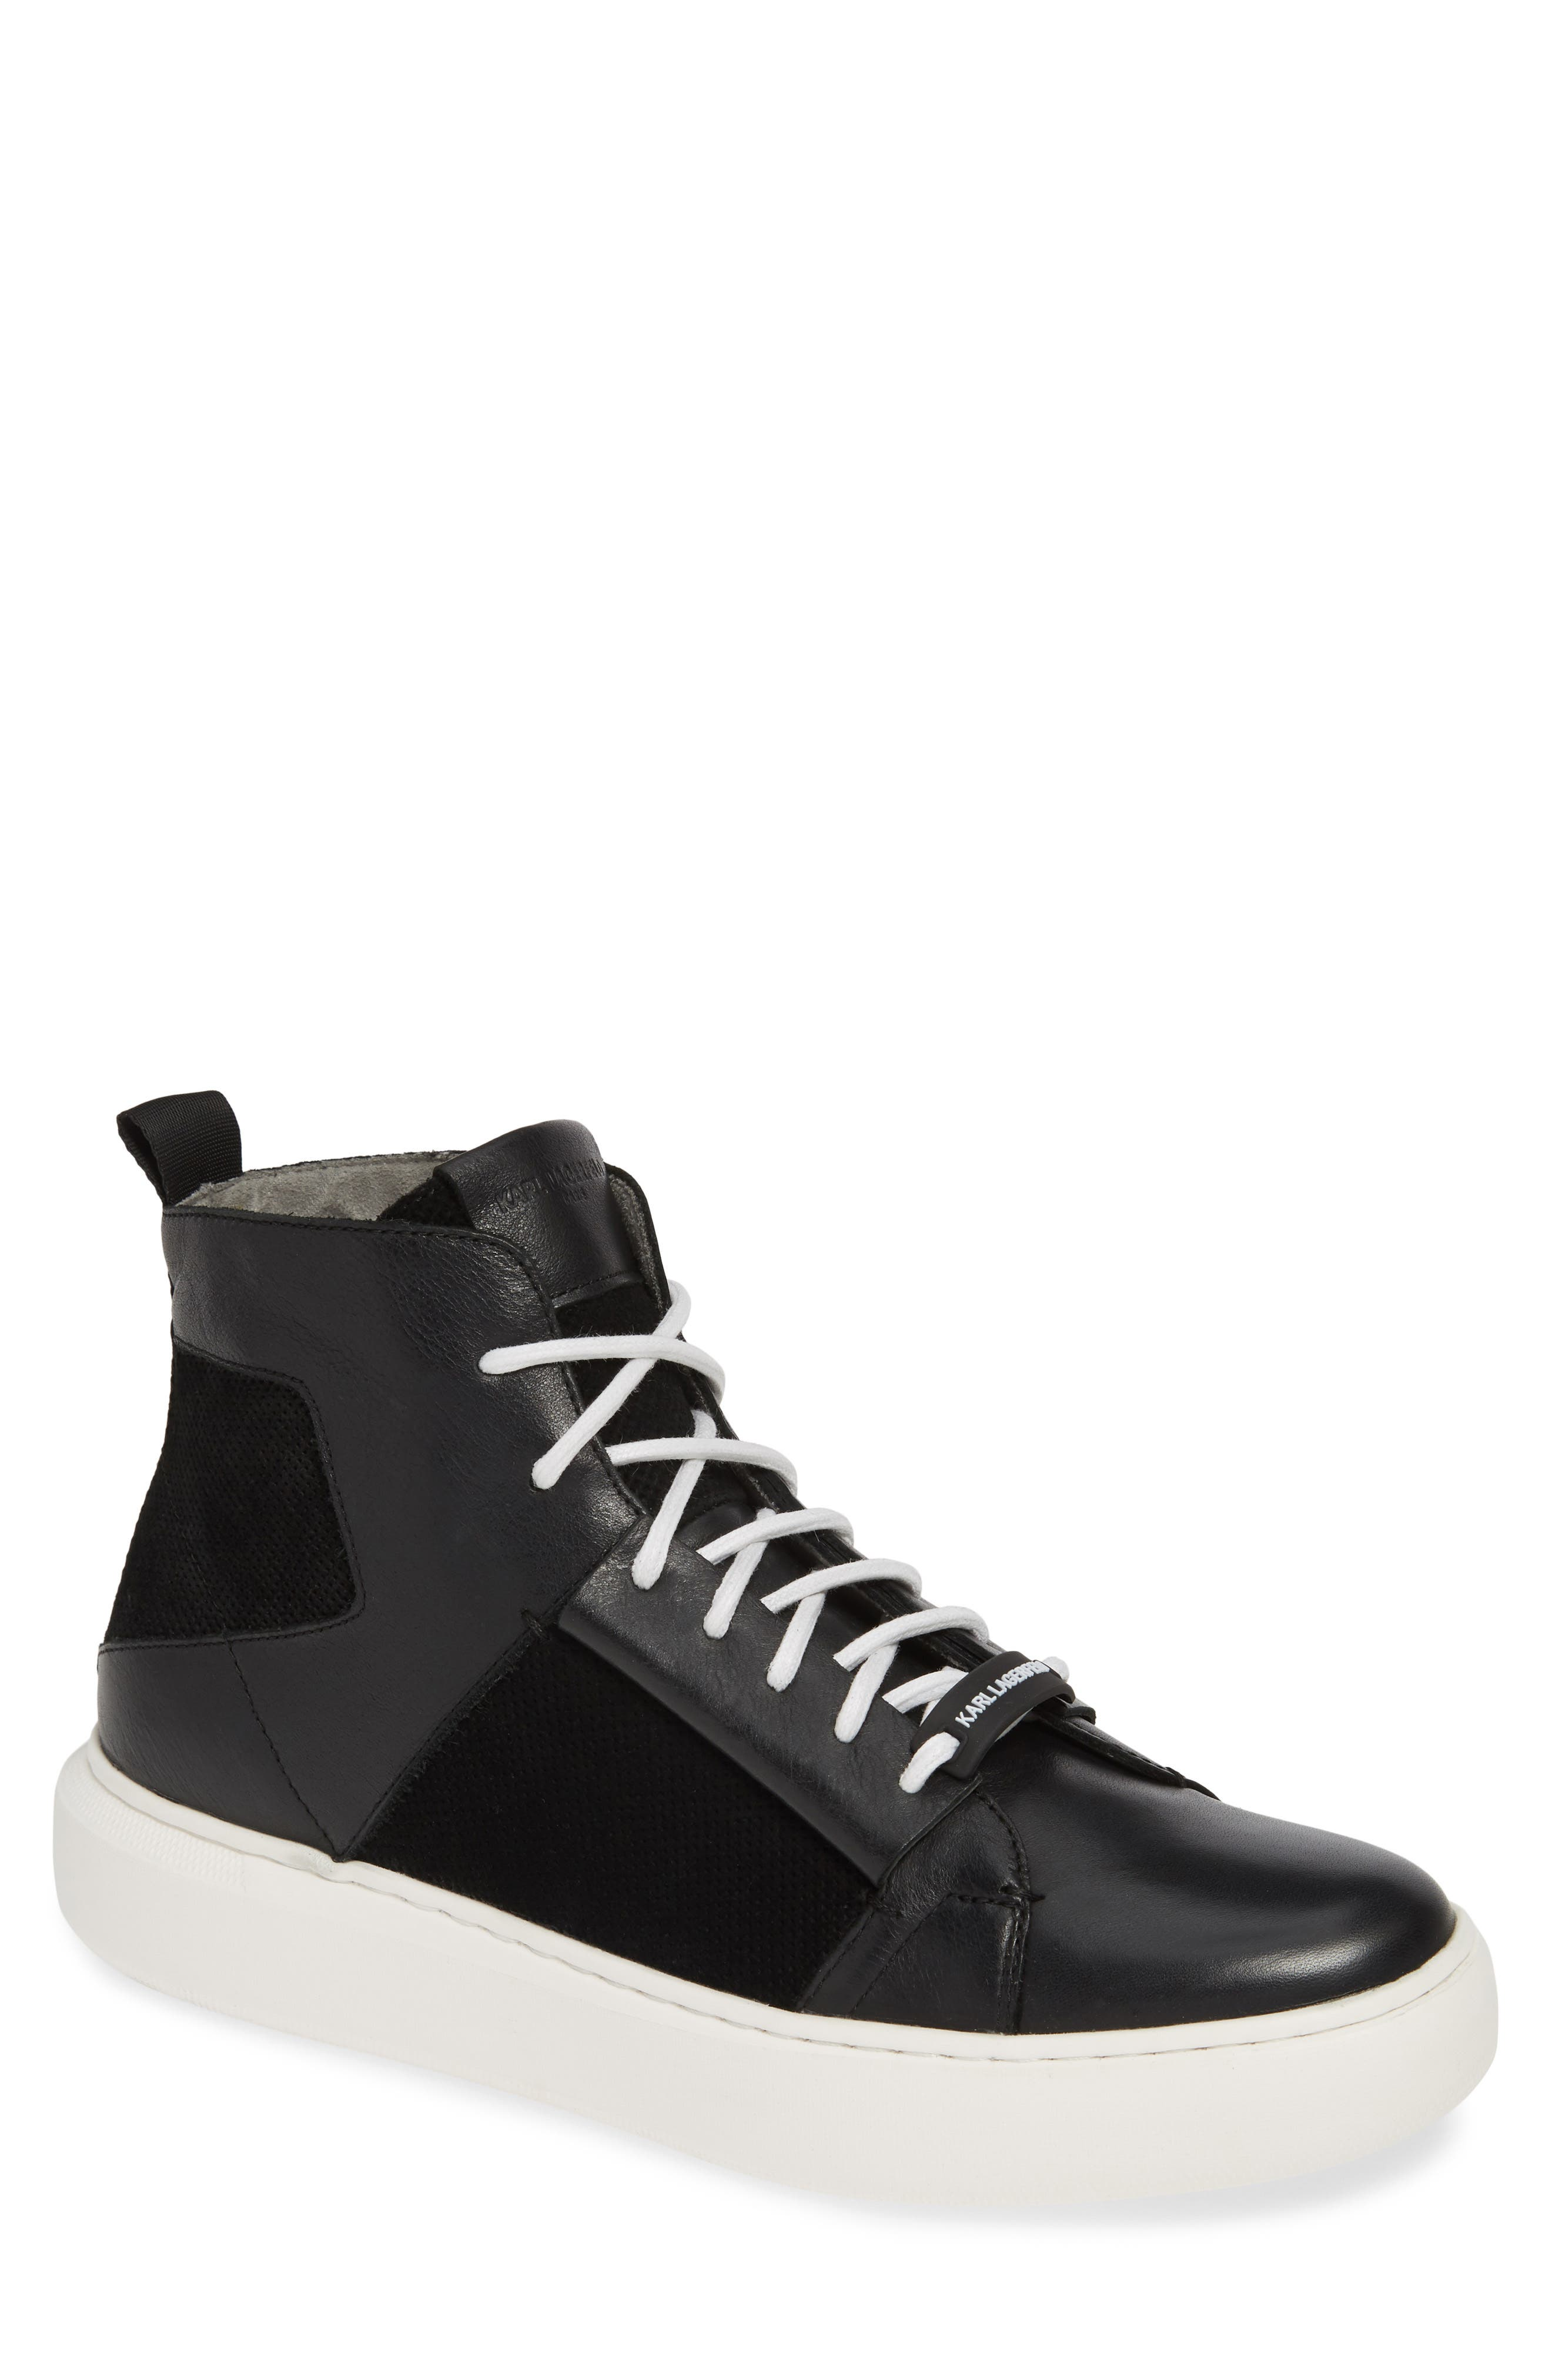 KARL LAGERFELD PARIS High Top Sneaker, Main, color, BLACK LEATHER